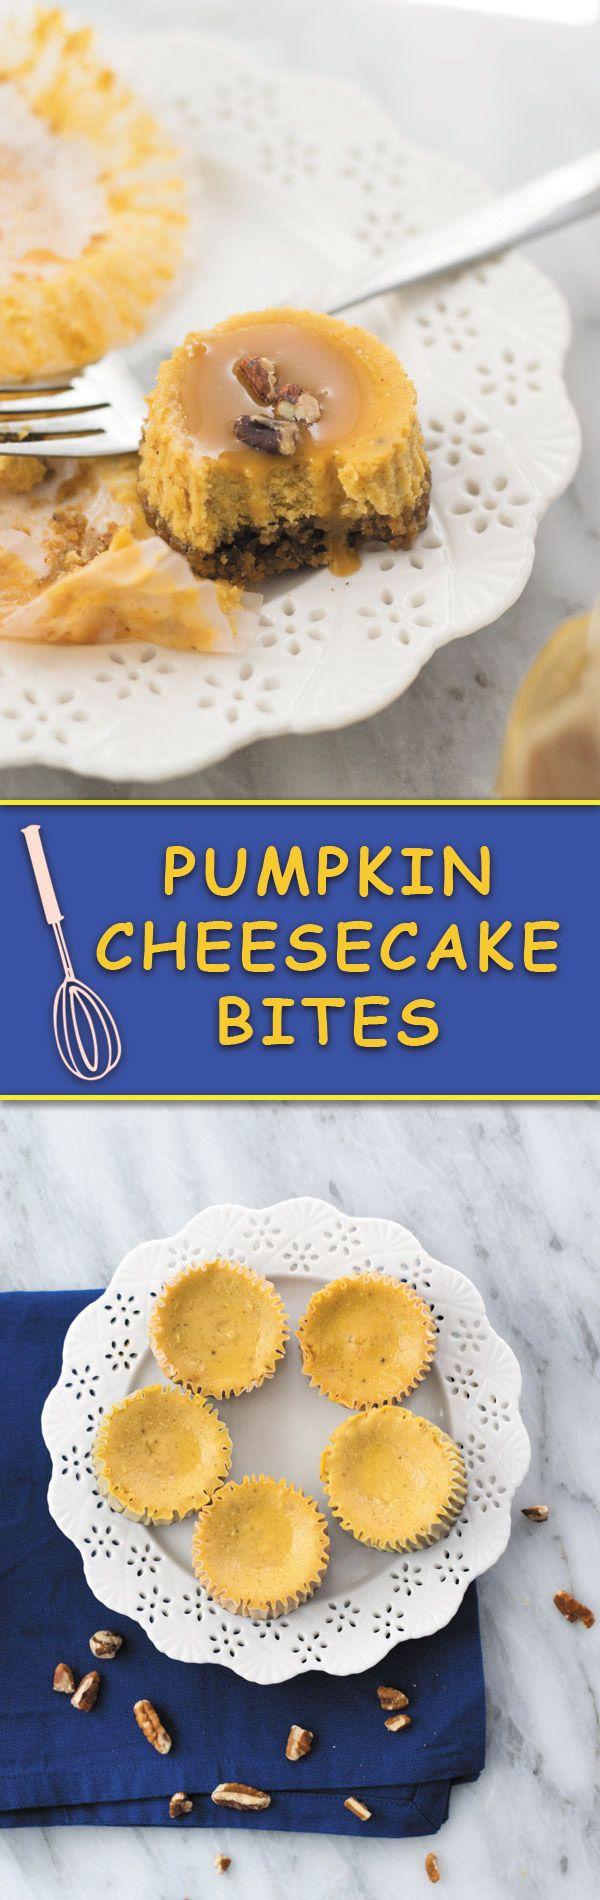 Pumpkin Cheesecake Bites - Delicious Pumpkin Cheesecake in bite forms ...